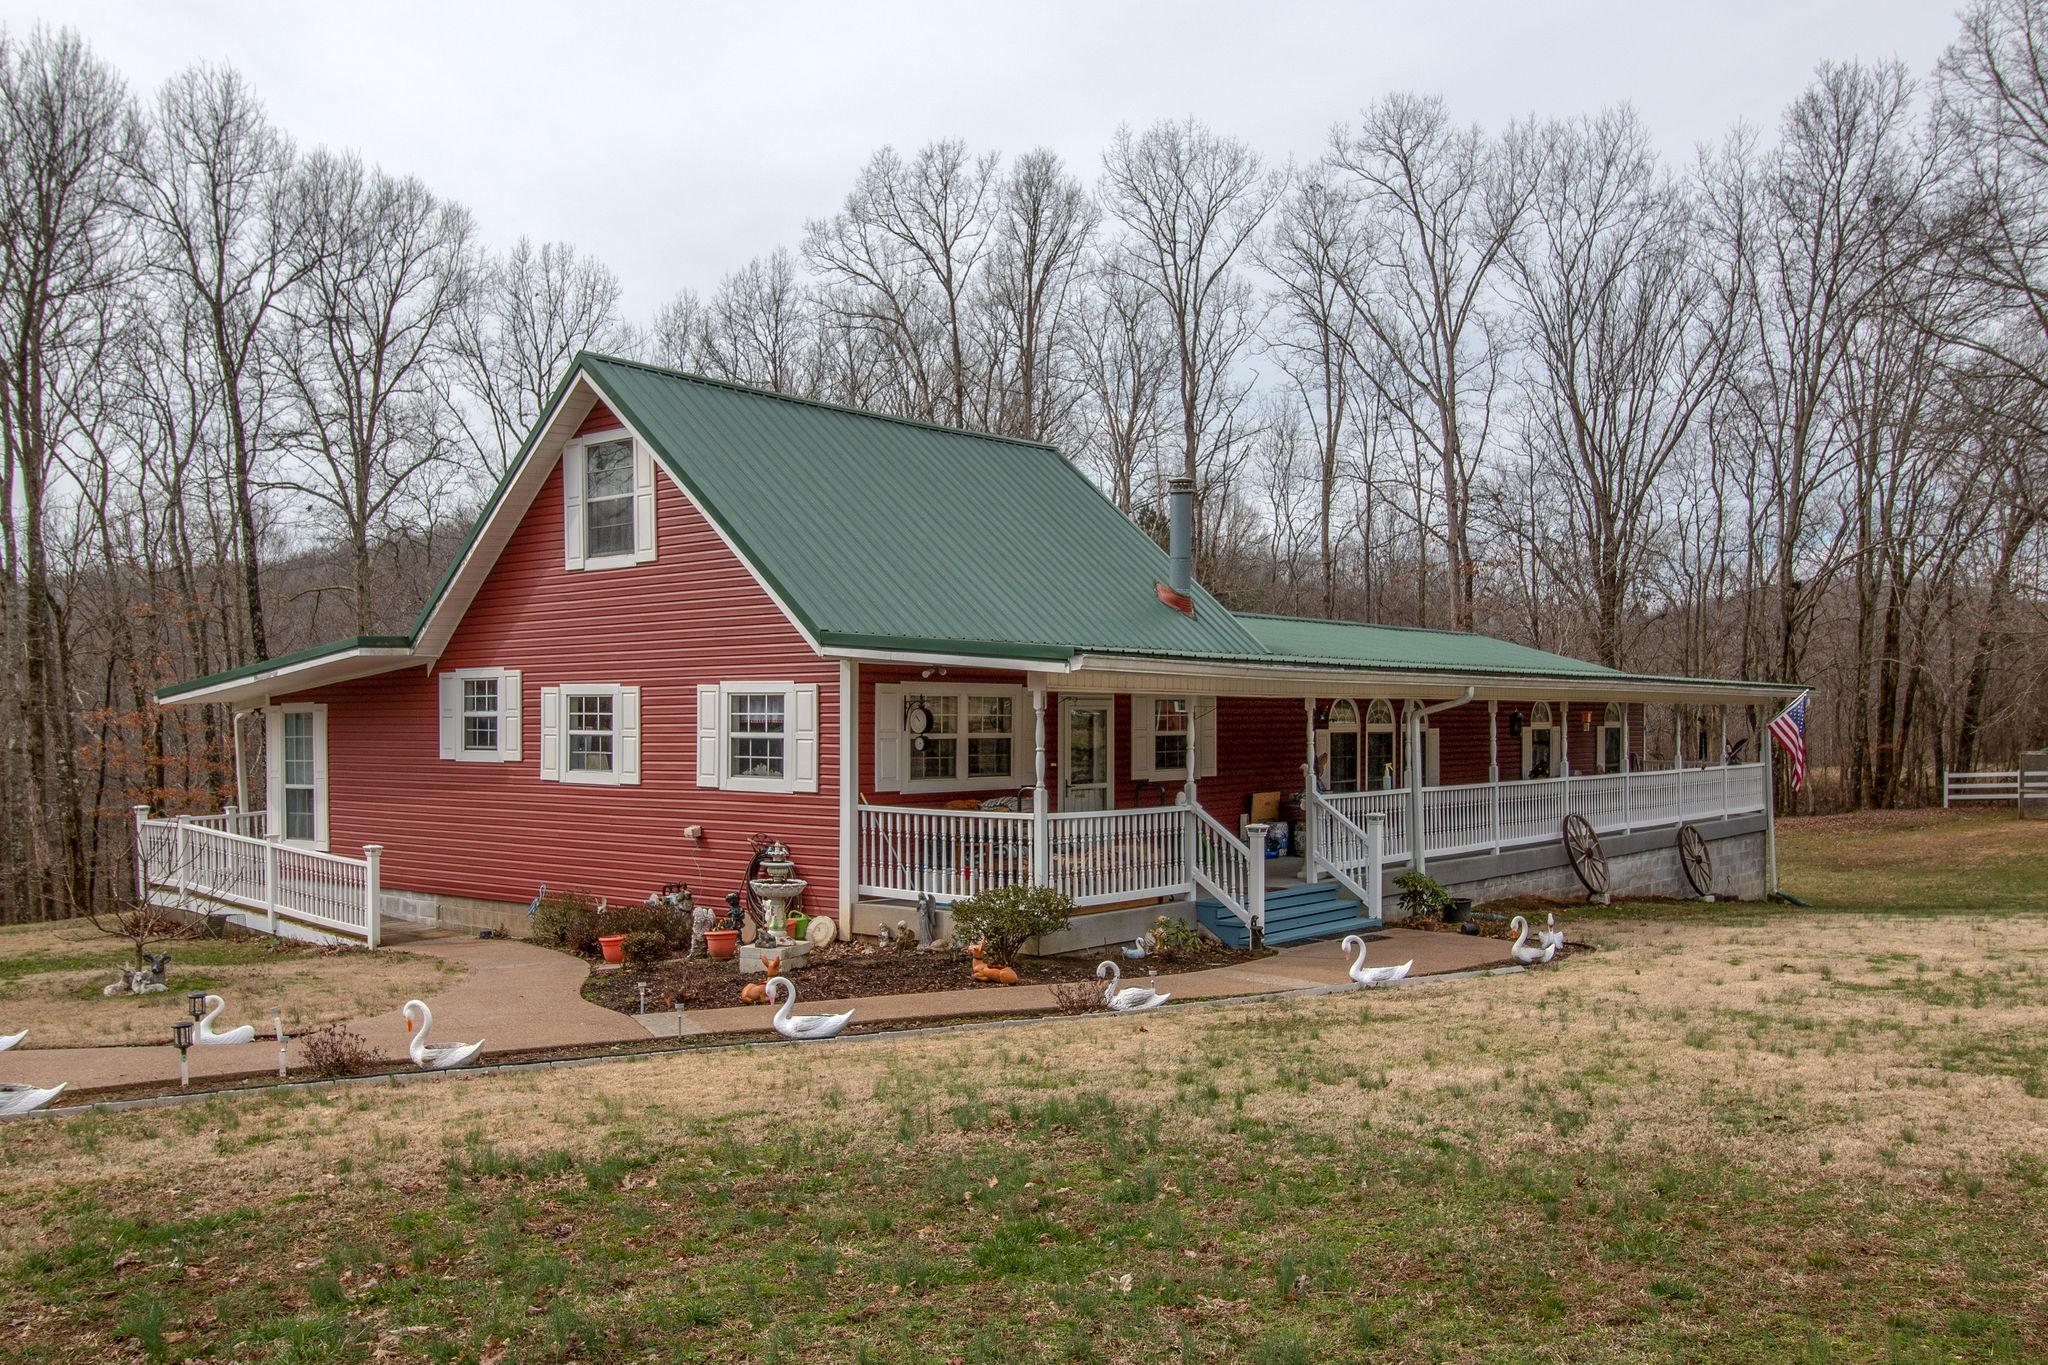 421 Rackley Rd, Hohenwald, TN 38462 - Hohenwald, TN real estate listing